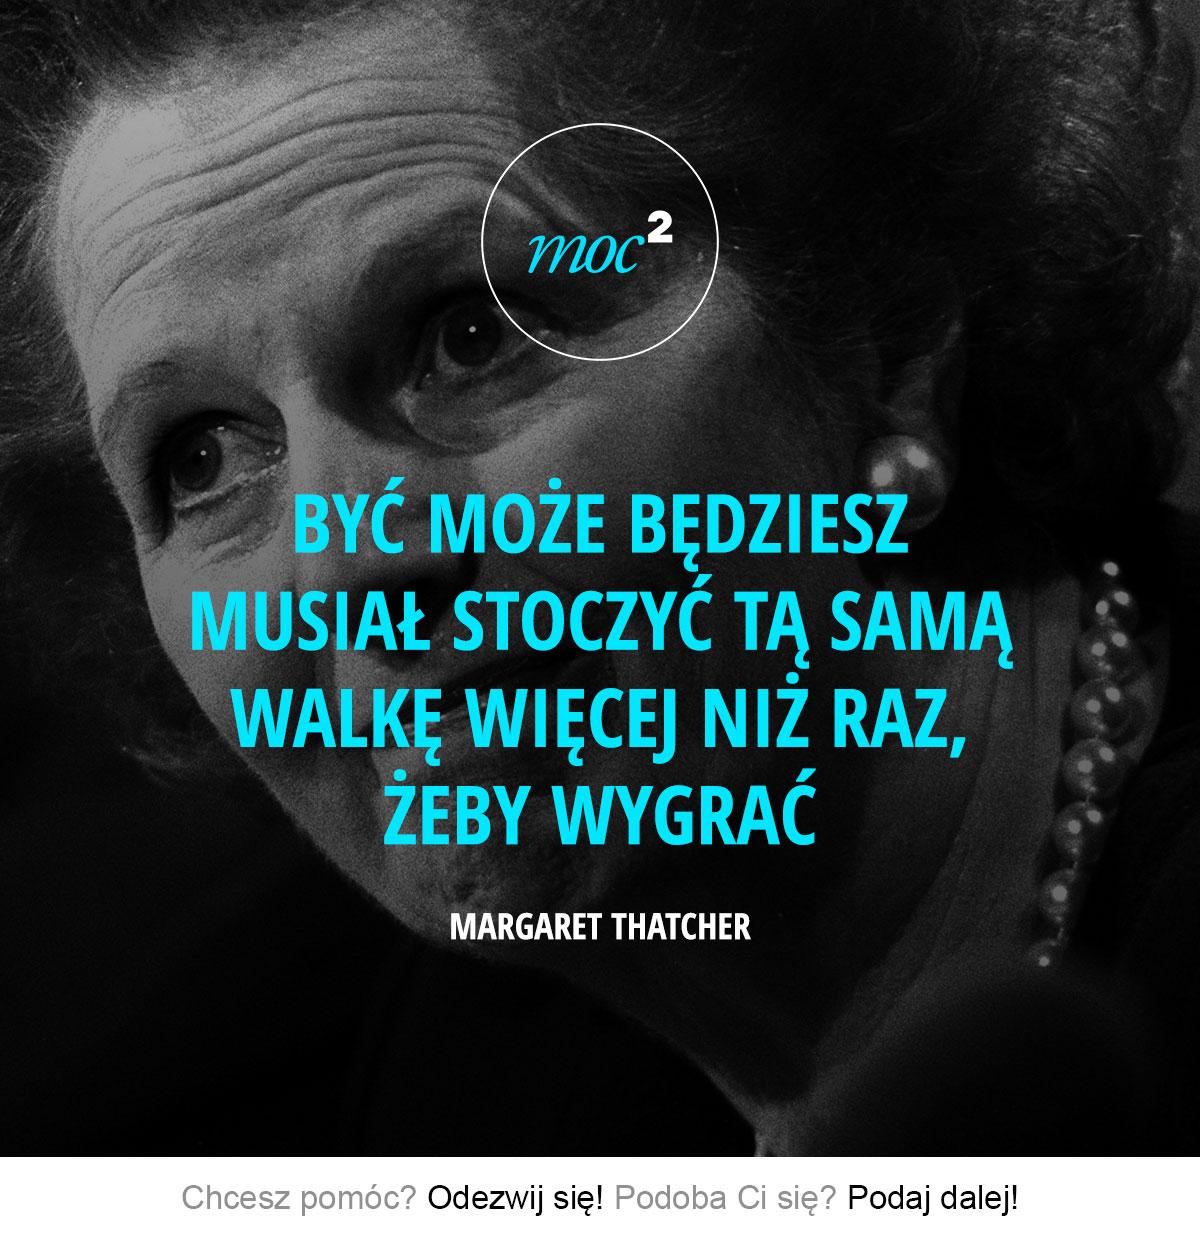 Archiwa Walka Moc² Moc Kwadrat